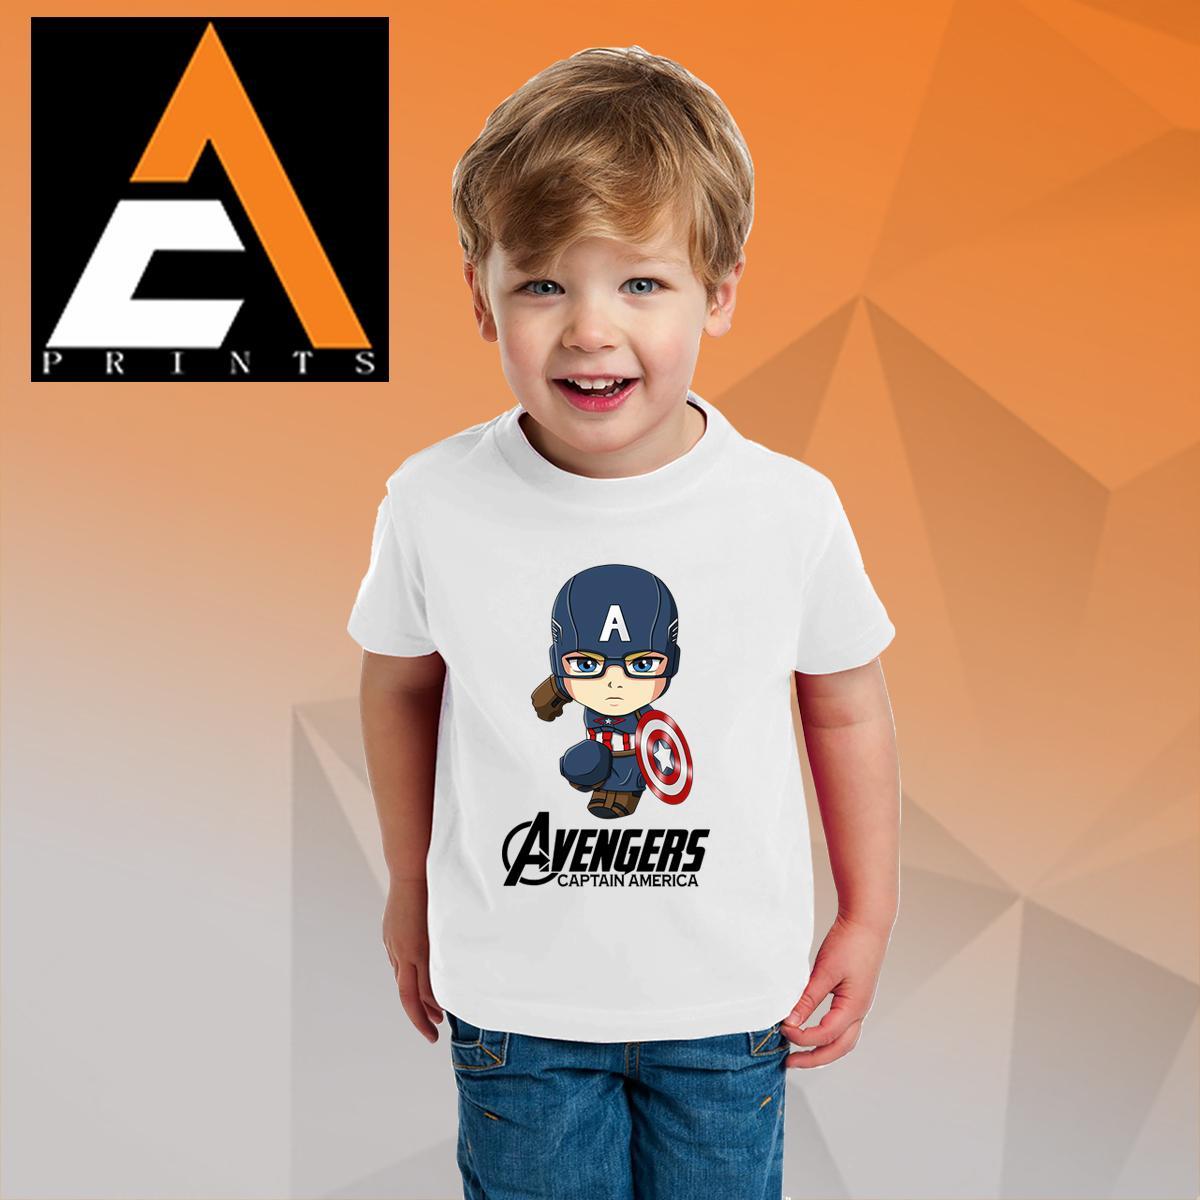 4042f4bb07461 Kids Shirt (UNISEX) Captain Americ  Avengers shirt 1-15 years old tshirt